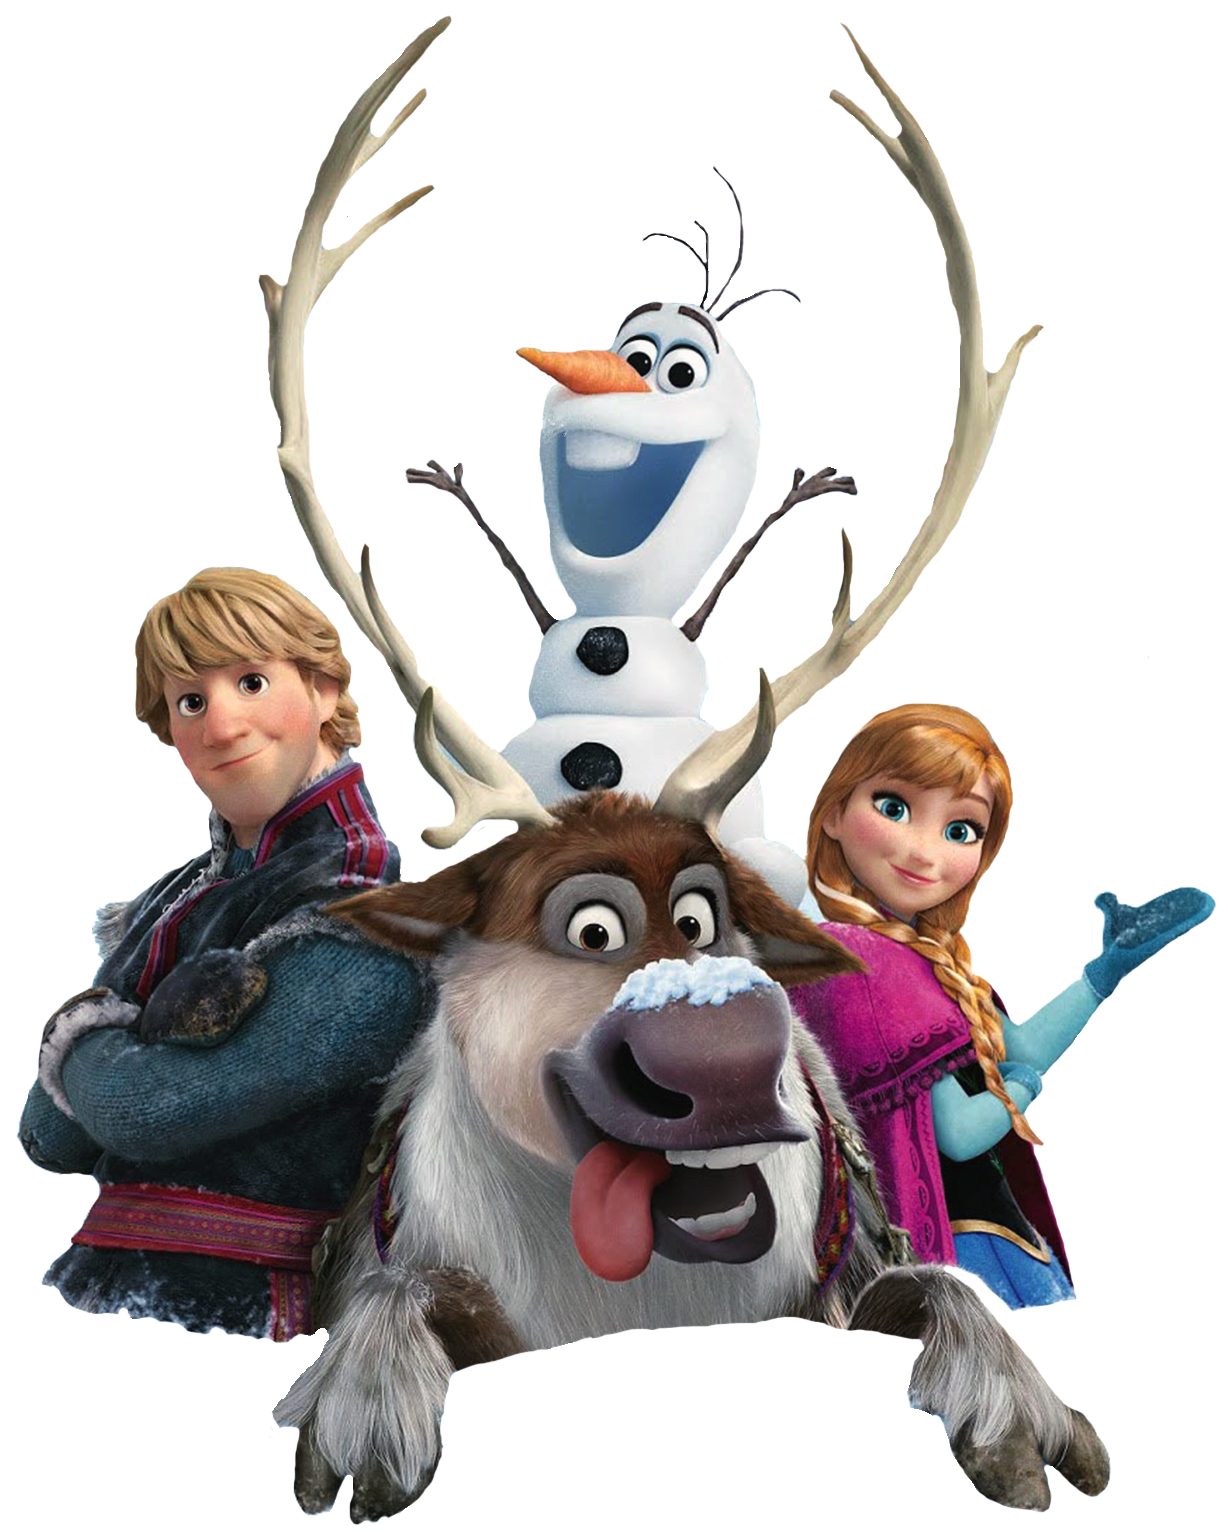 Frozen Clipart. | Oh My Fiesta! in english